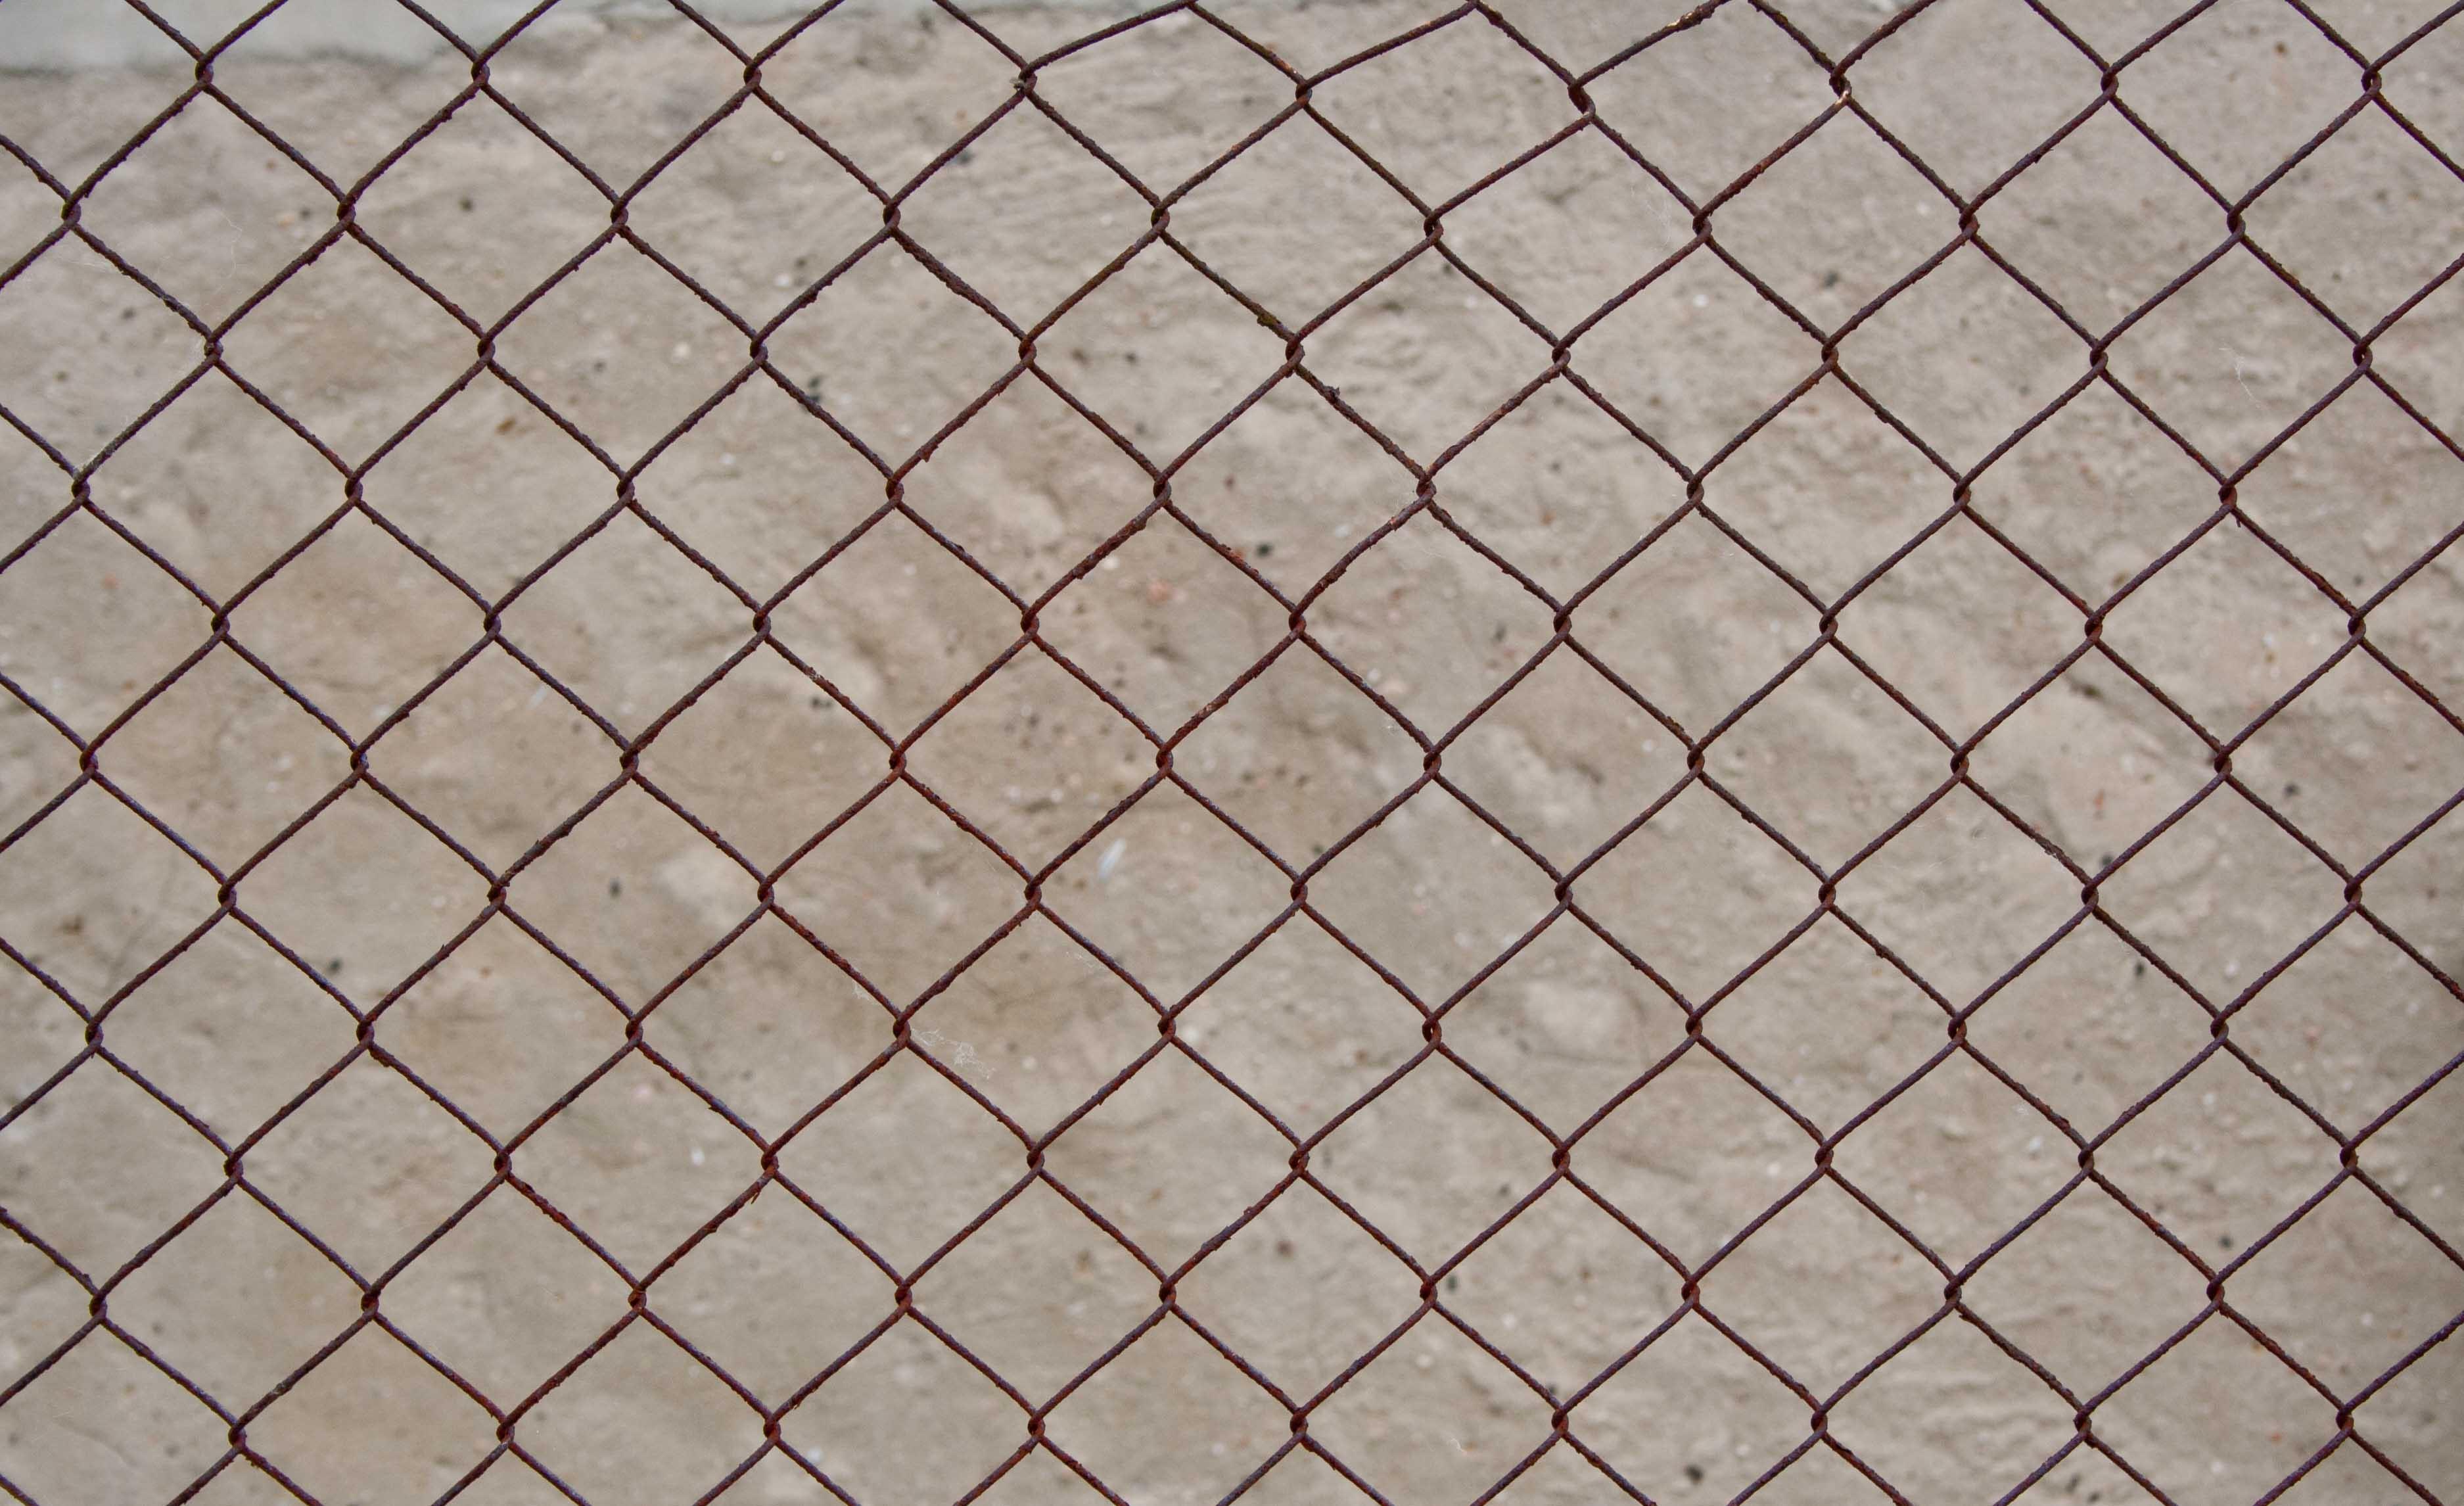 Fence Texture Floor Pattern Line Tile Circle Textile Art Background Design Net Wire Mesh Flooring